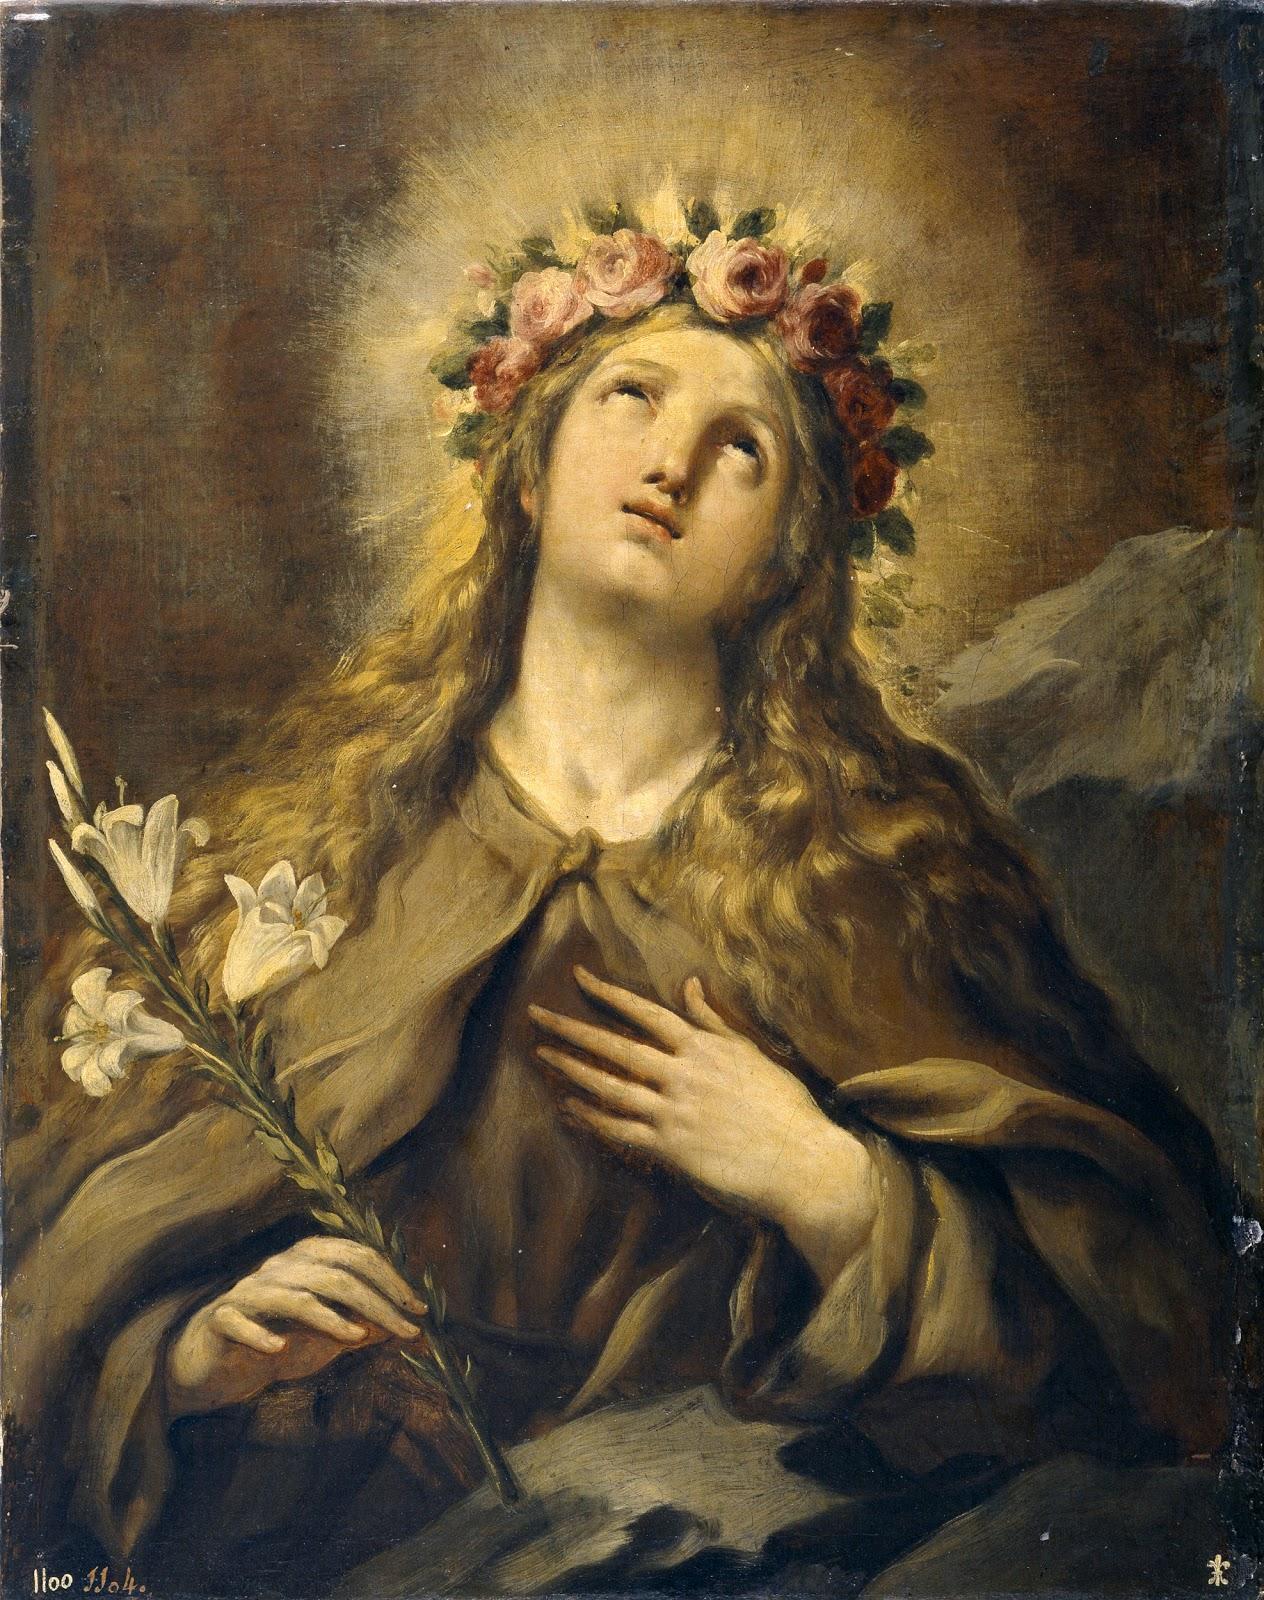 Luca giordano baroque era painter tutt 39 art for Famous artist in baroque period